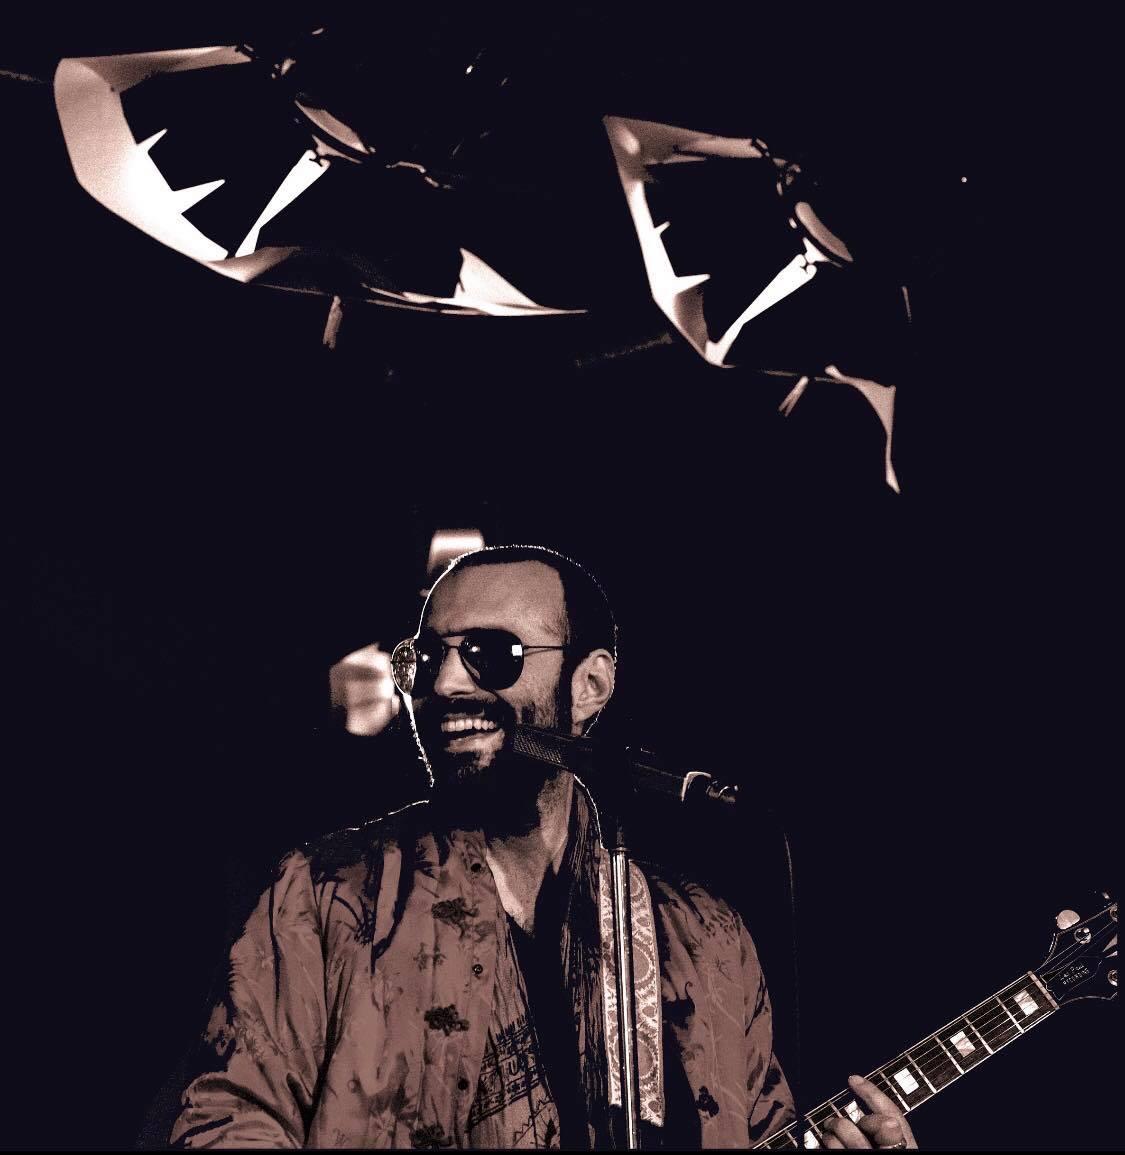 Franky Selector sortira le quatrième album de sa carrière avec Never Better le 16 octobre